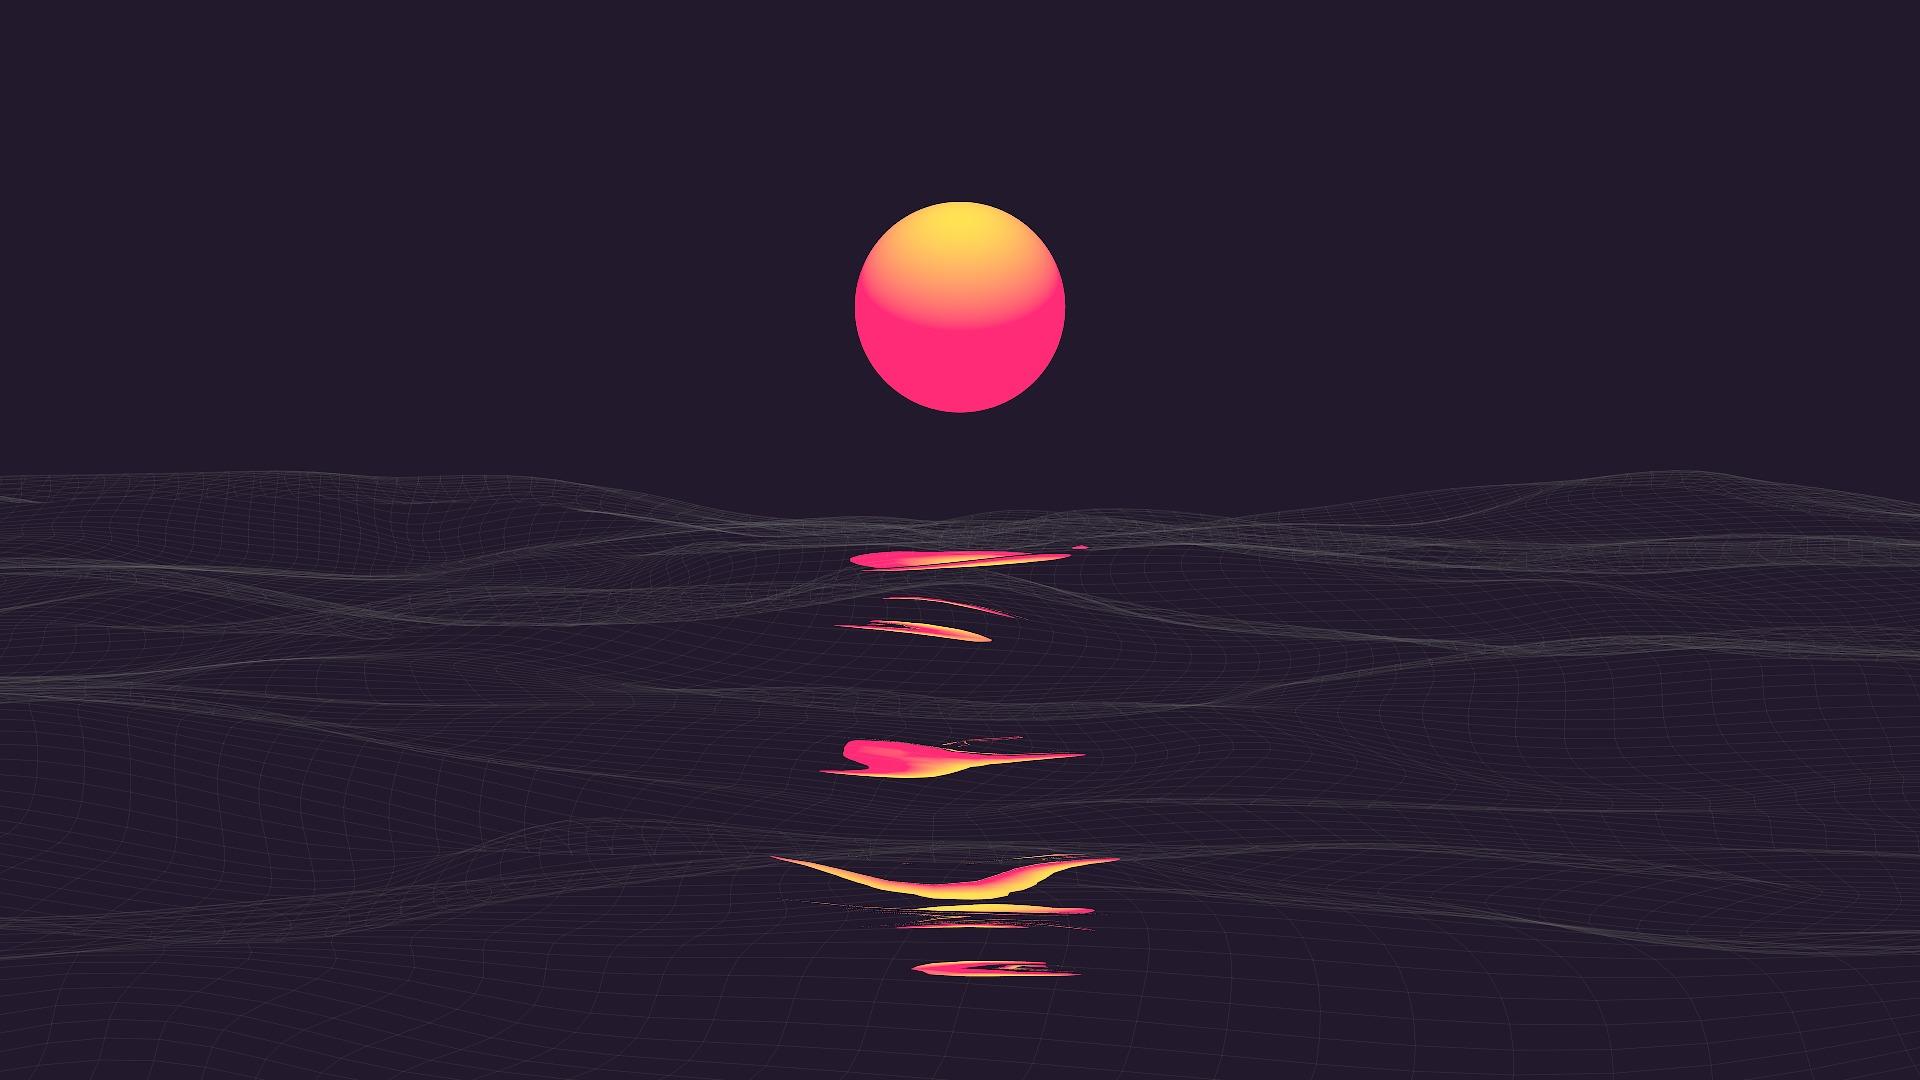 Abstract Vaporwave Retrowave Sun Reflaction Wallpaper, HD ...